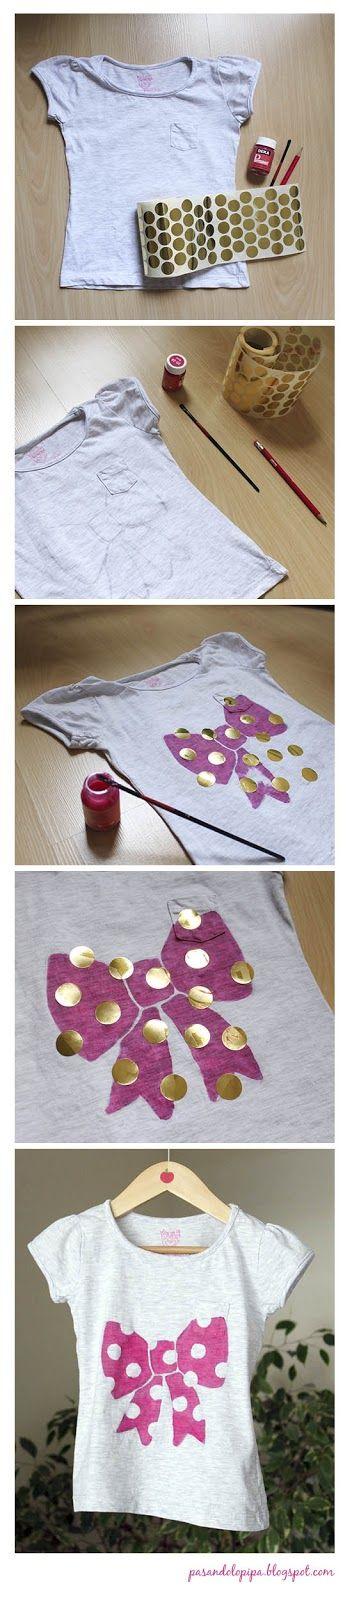 pasandolopipa: Camiseta con lazo para Ana